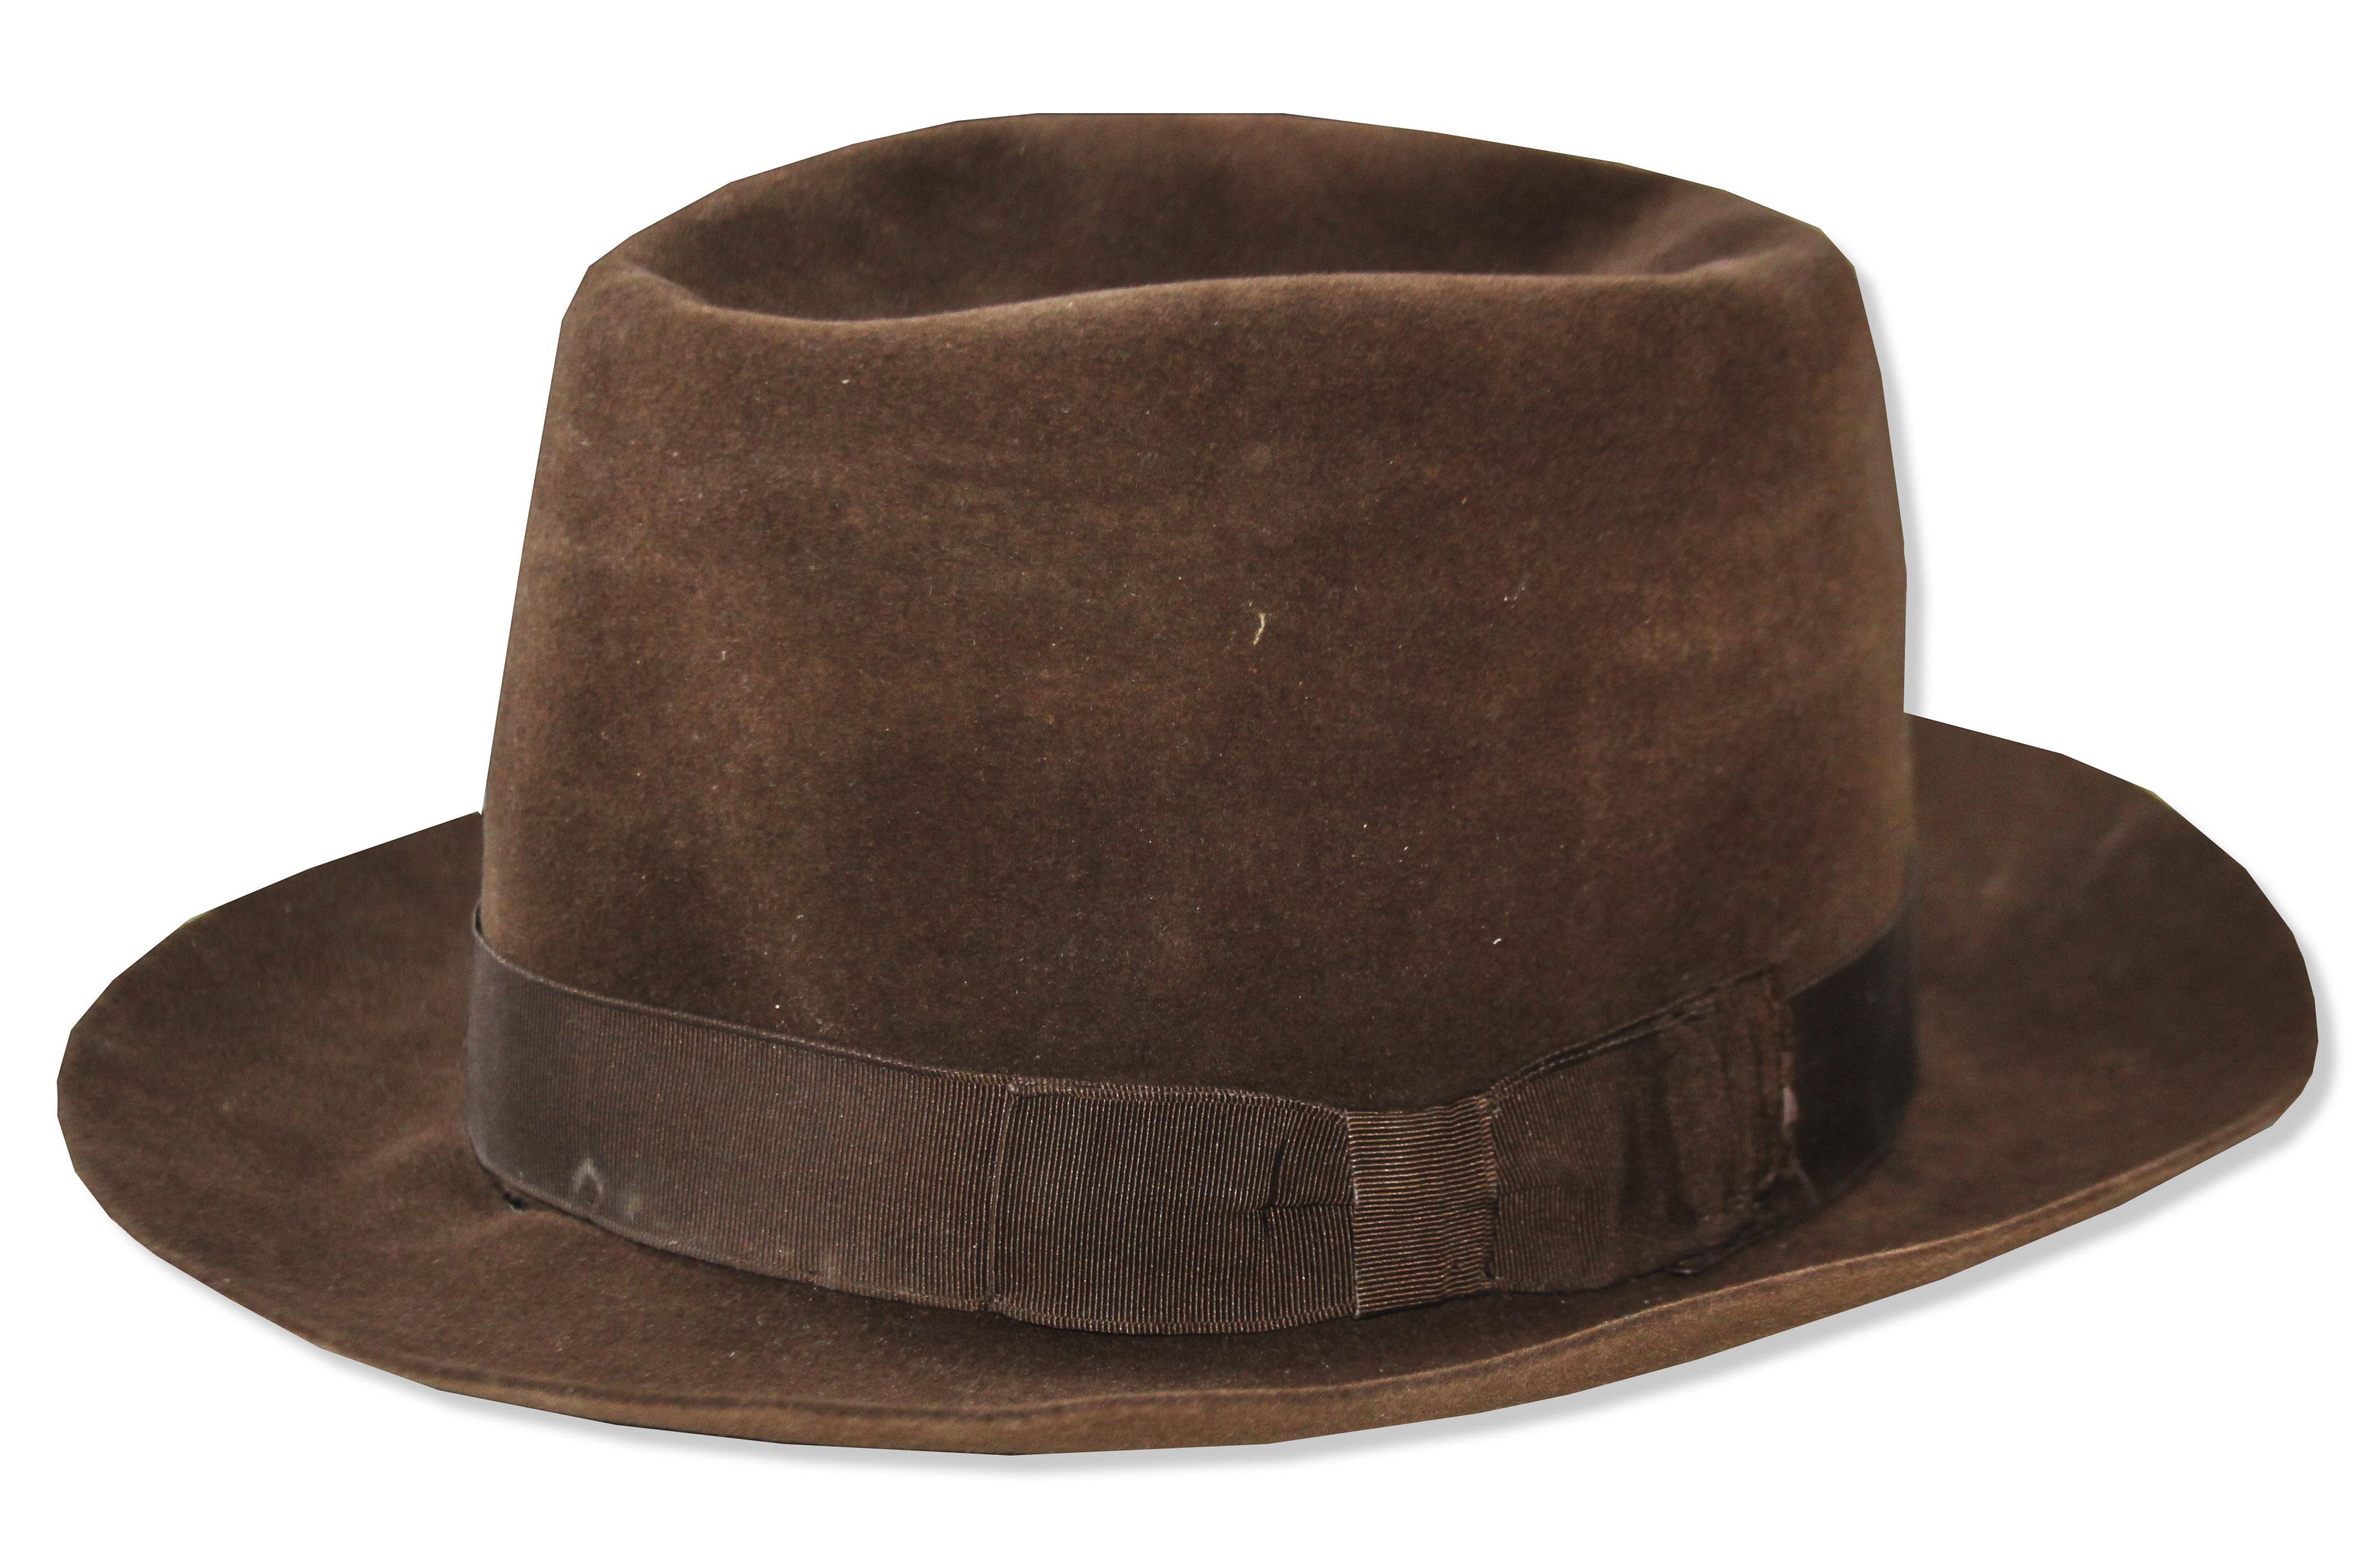 adb886369cbb5 ... Red Skelton Famous Brown Derby Hat Worn as   Clem Kadiddlehopper   on    ...